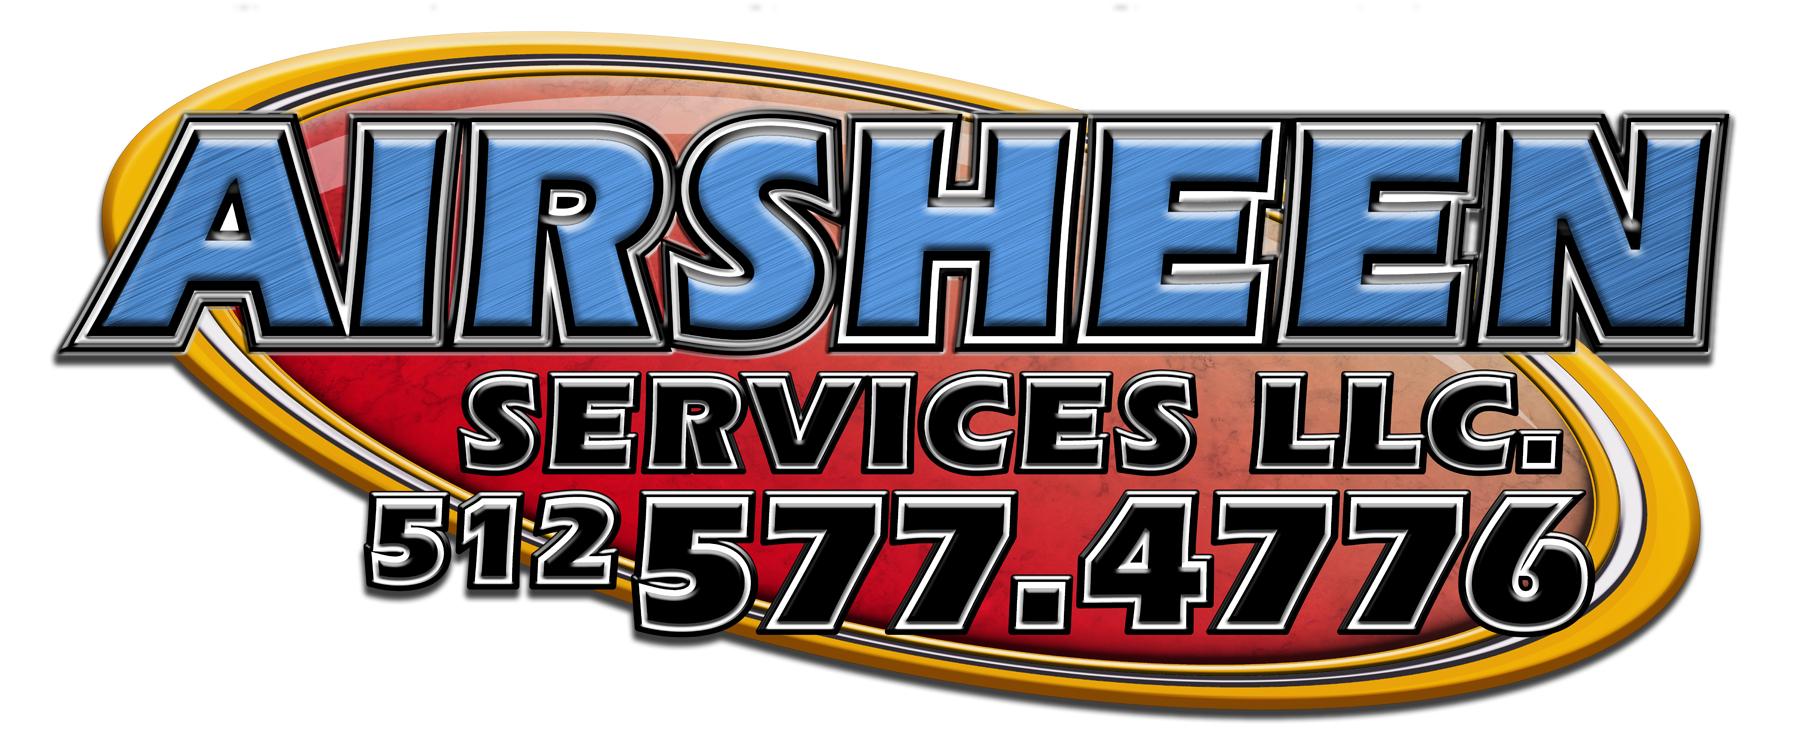 Airsheen Services LLC